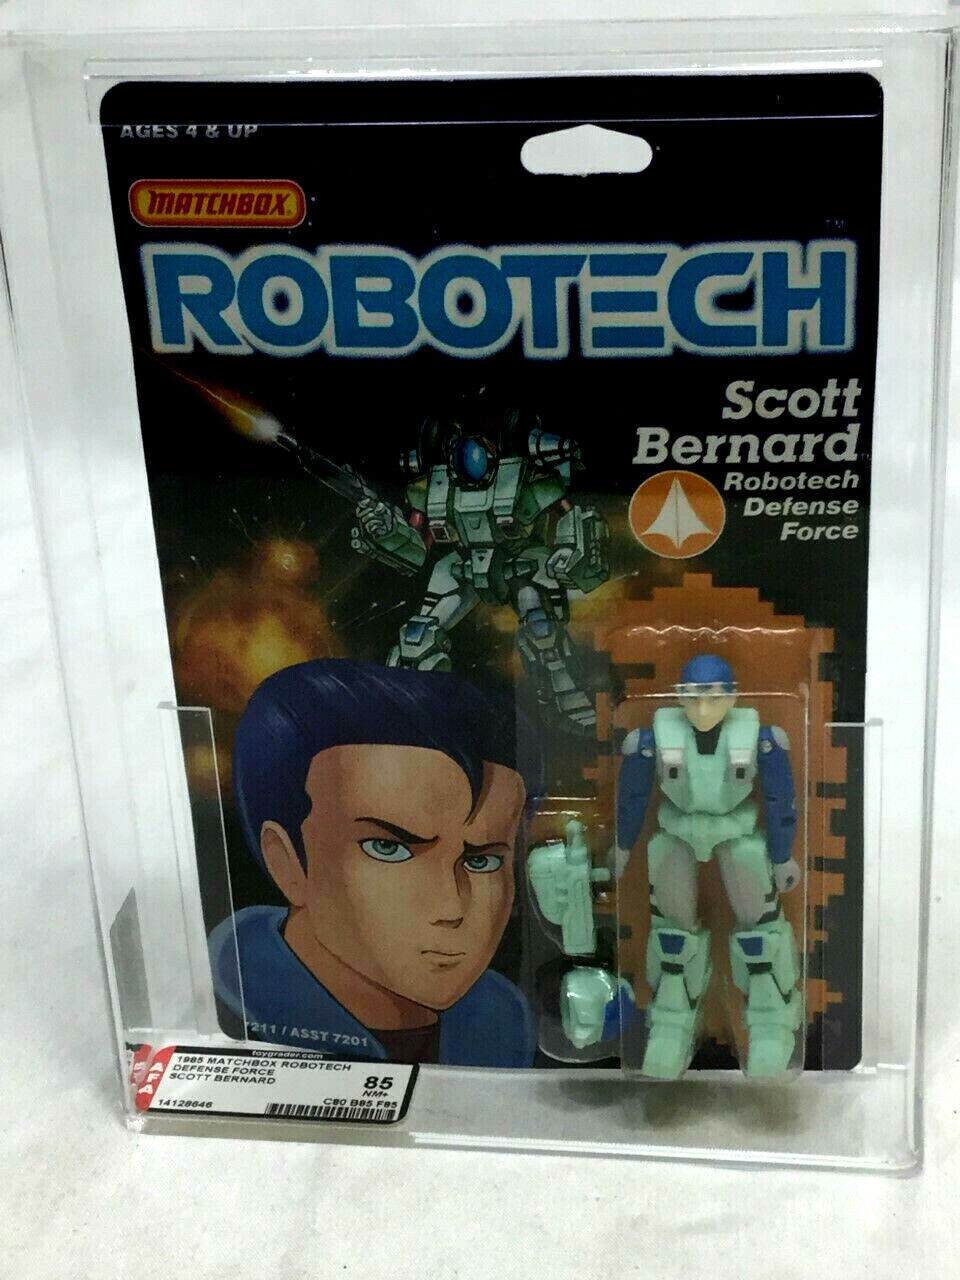 1986 Vintage Matchbox Robotech Scott Bernard Figure MOC Sealed AFA 85 Mint